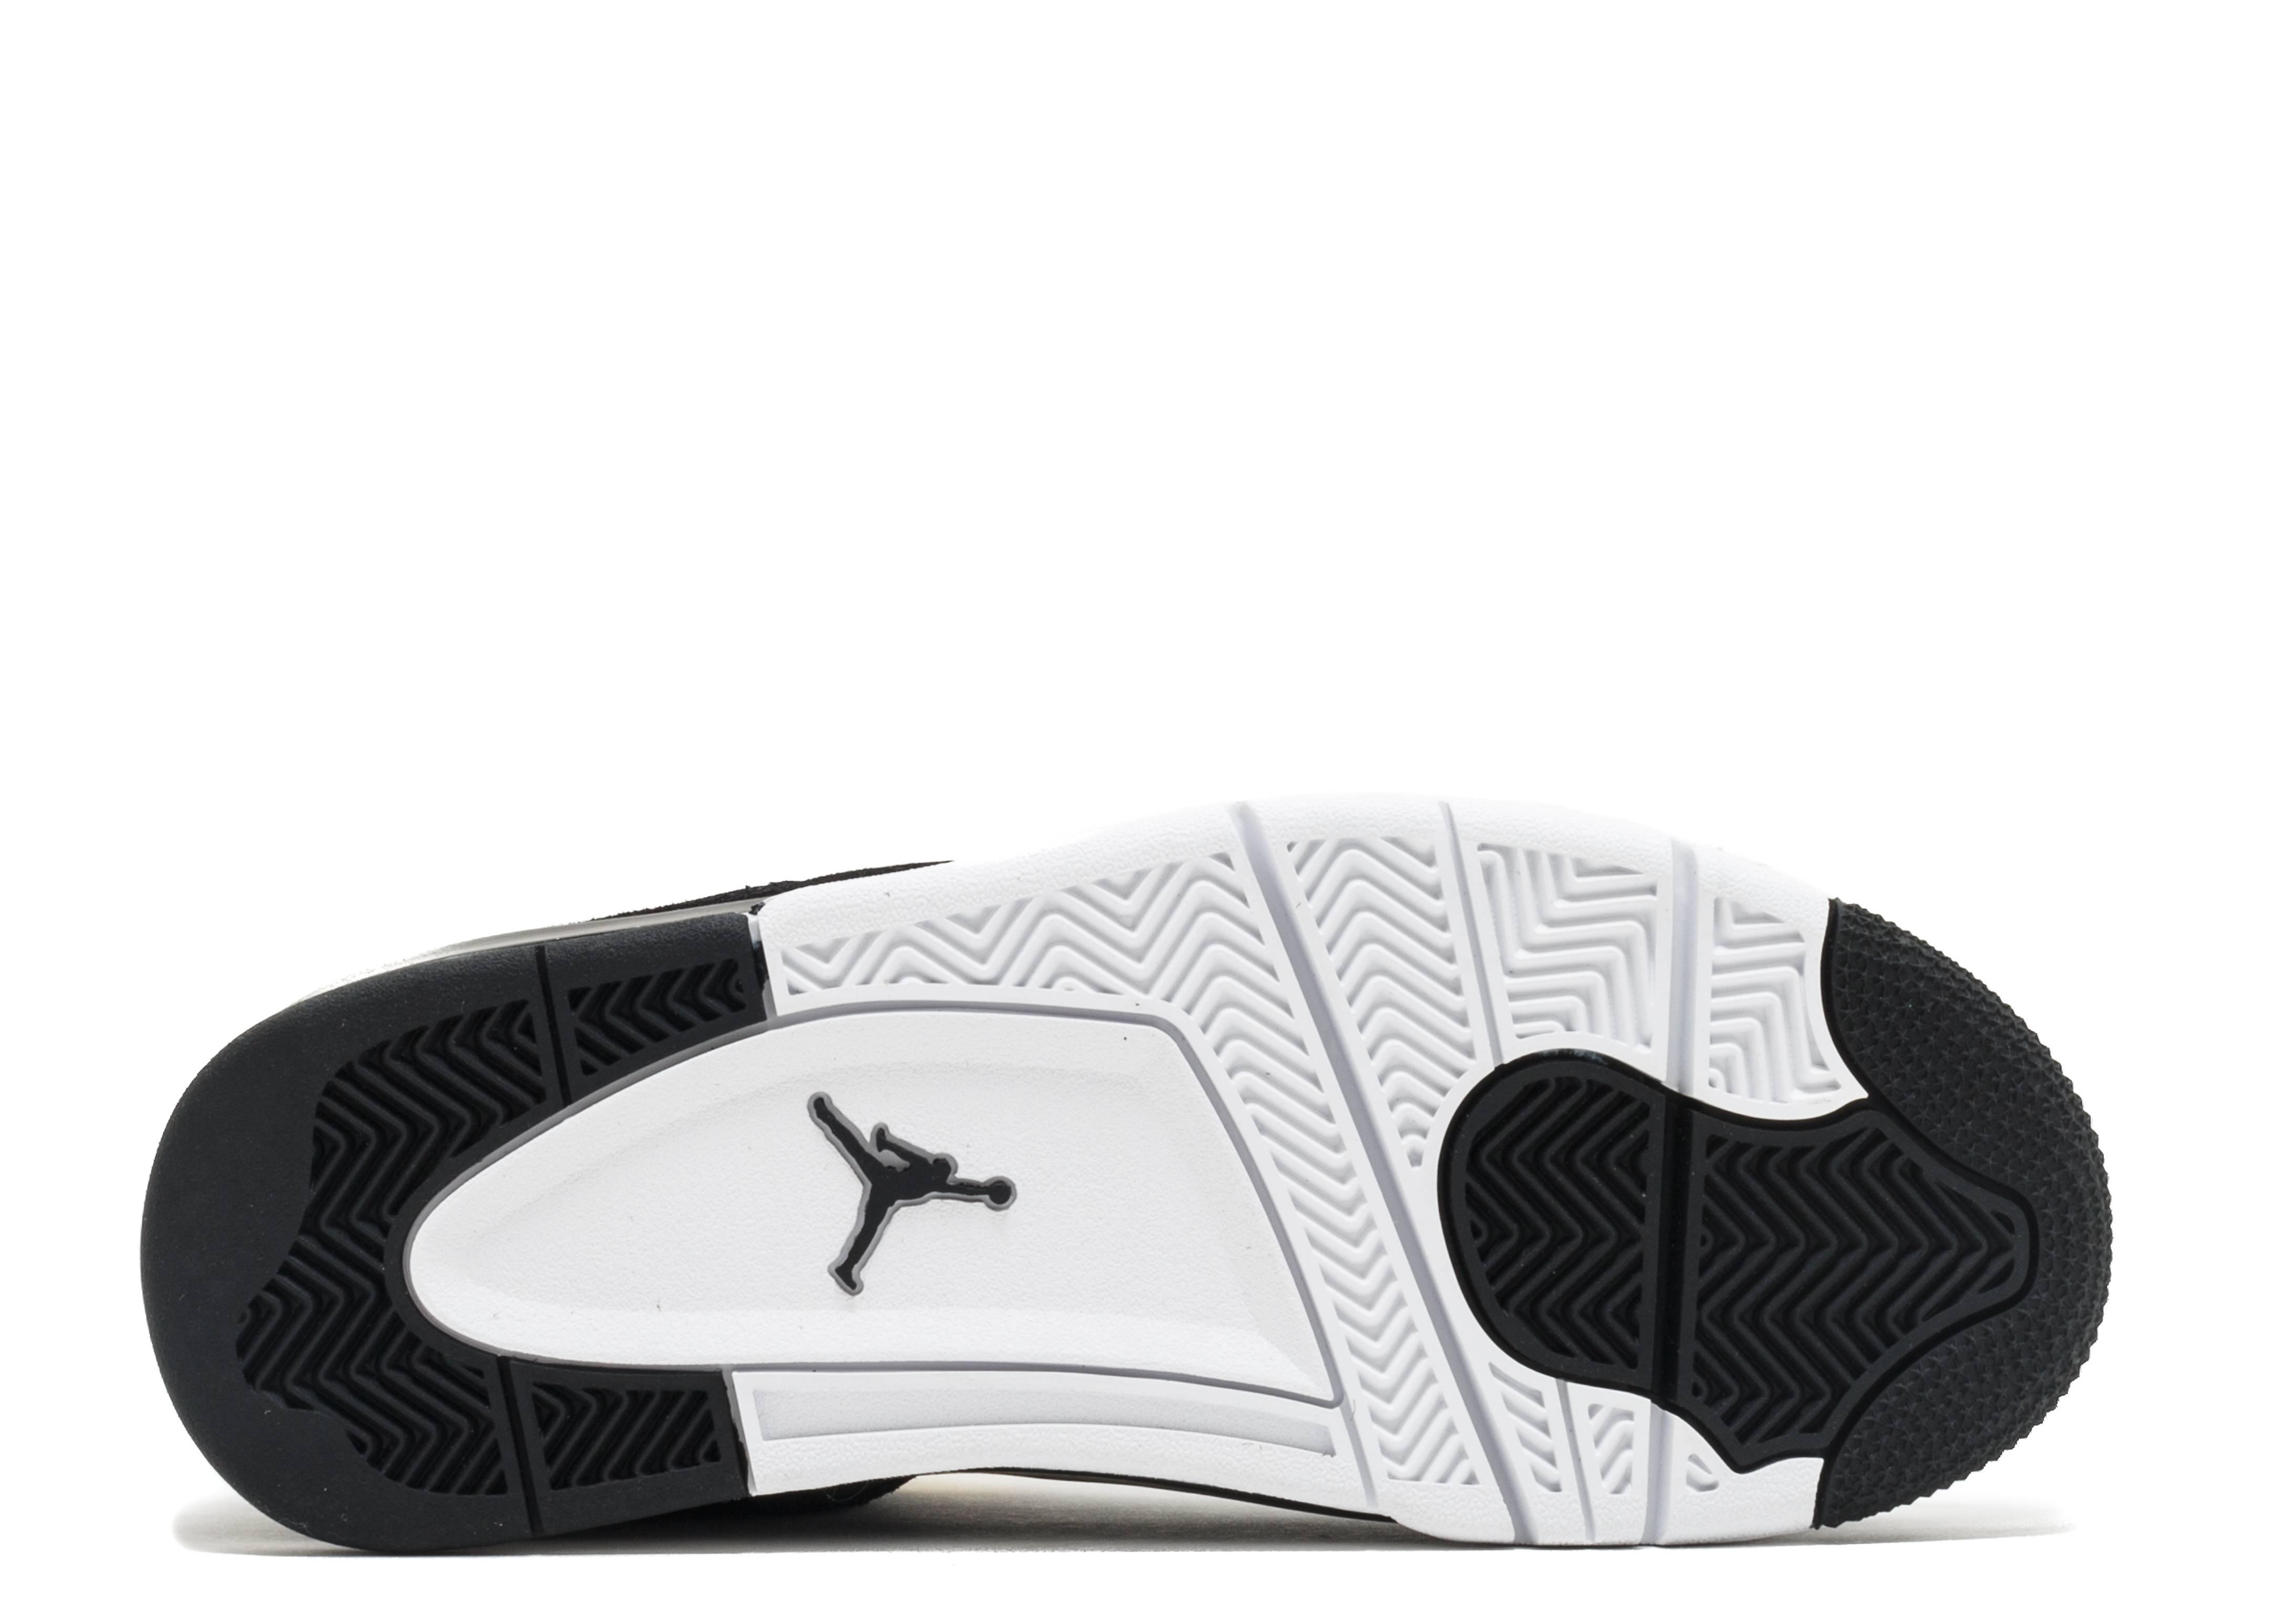 Air Jordan 4 Retro GS 'Royalty'